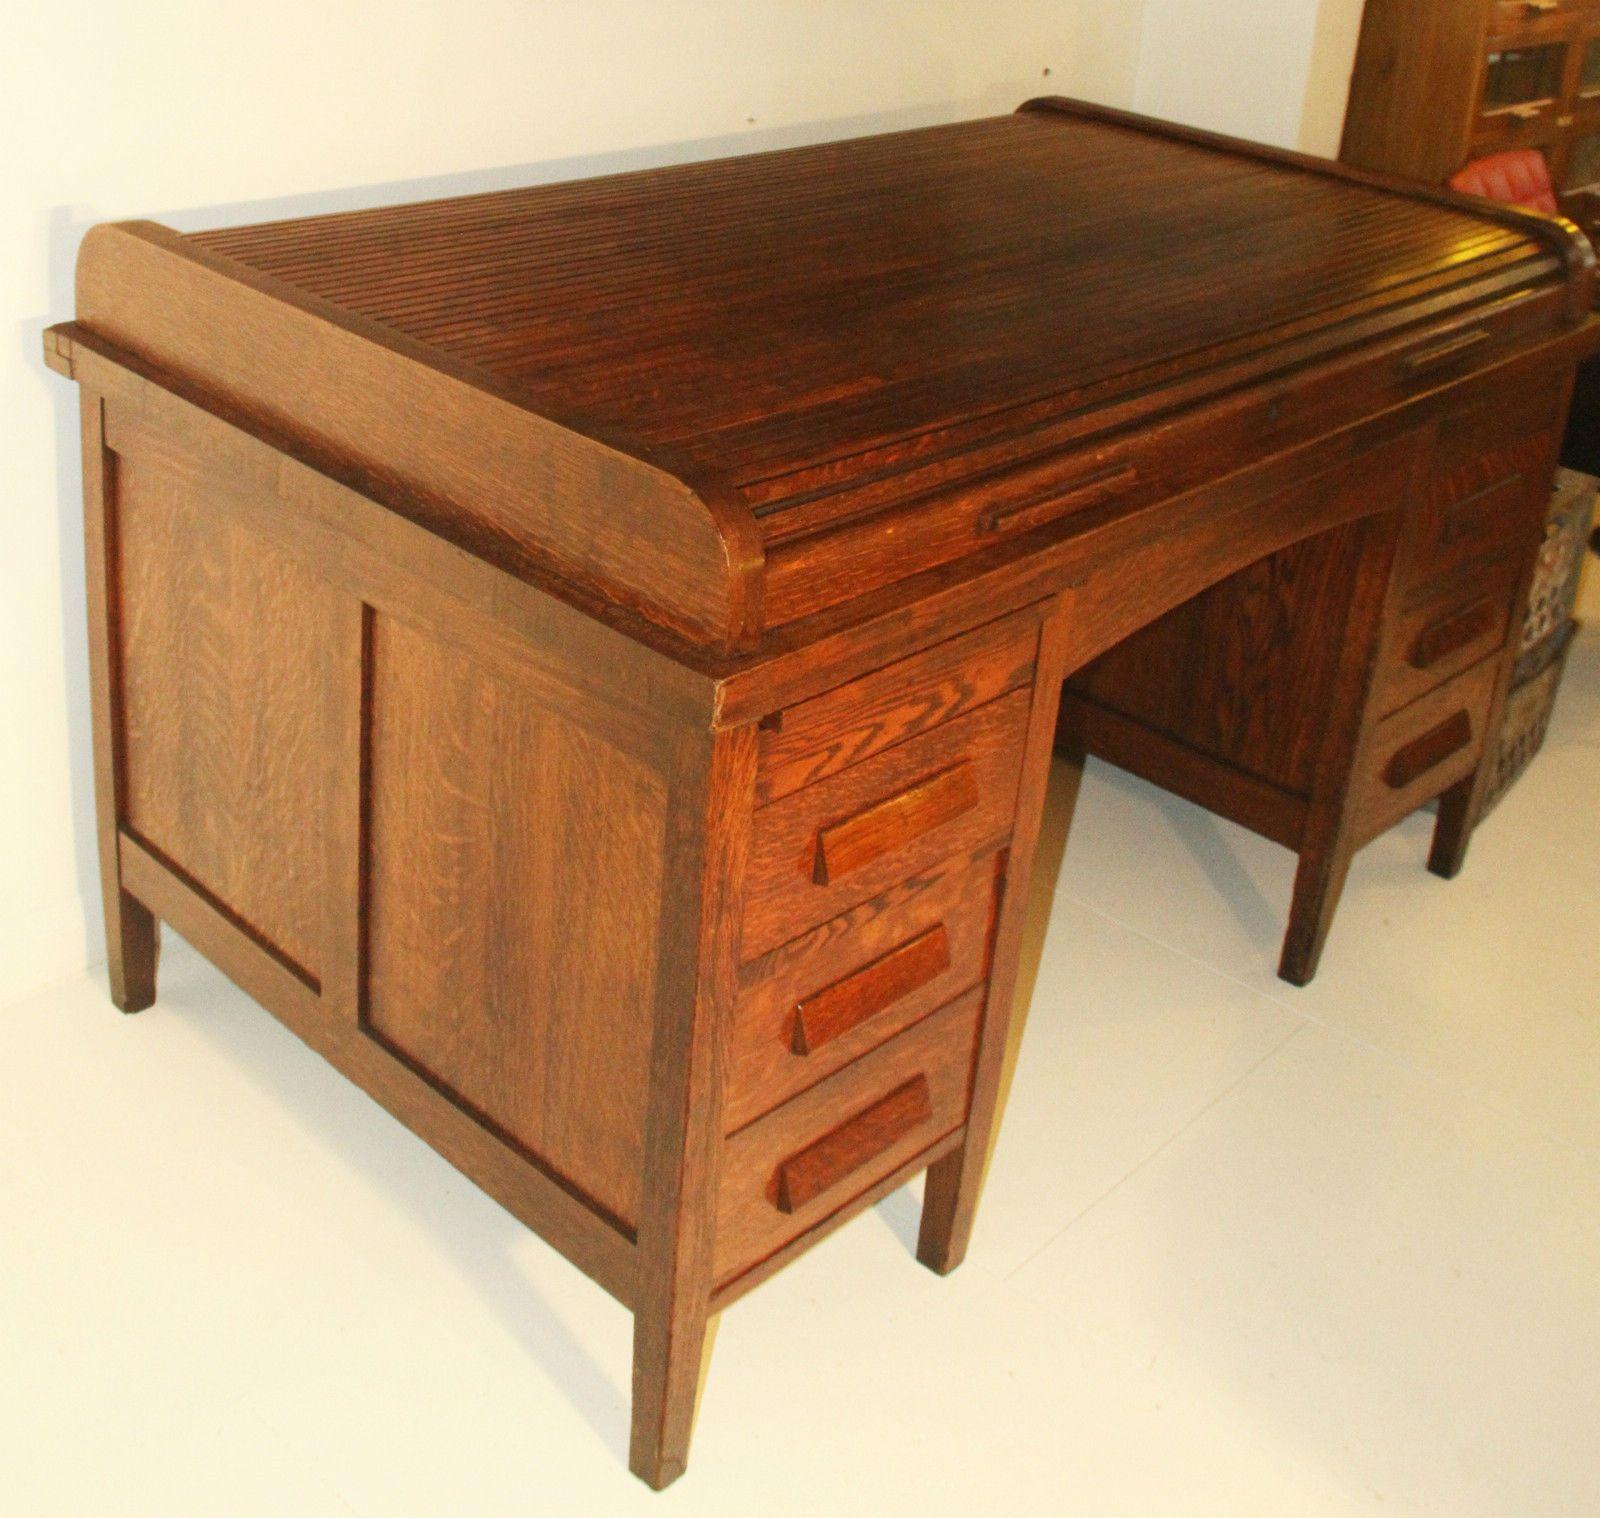 oak world desk mr a robinson presented desks antique roll top henry p antiques to edwardian